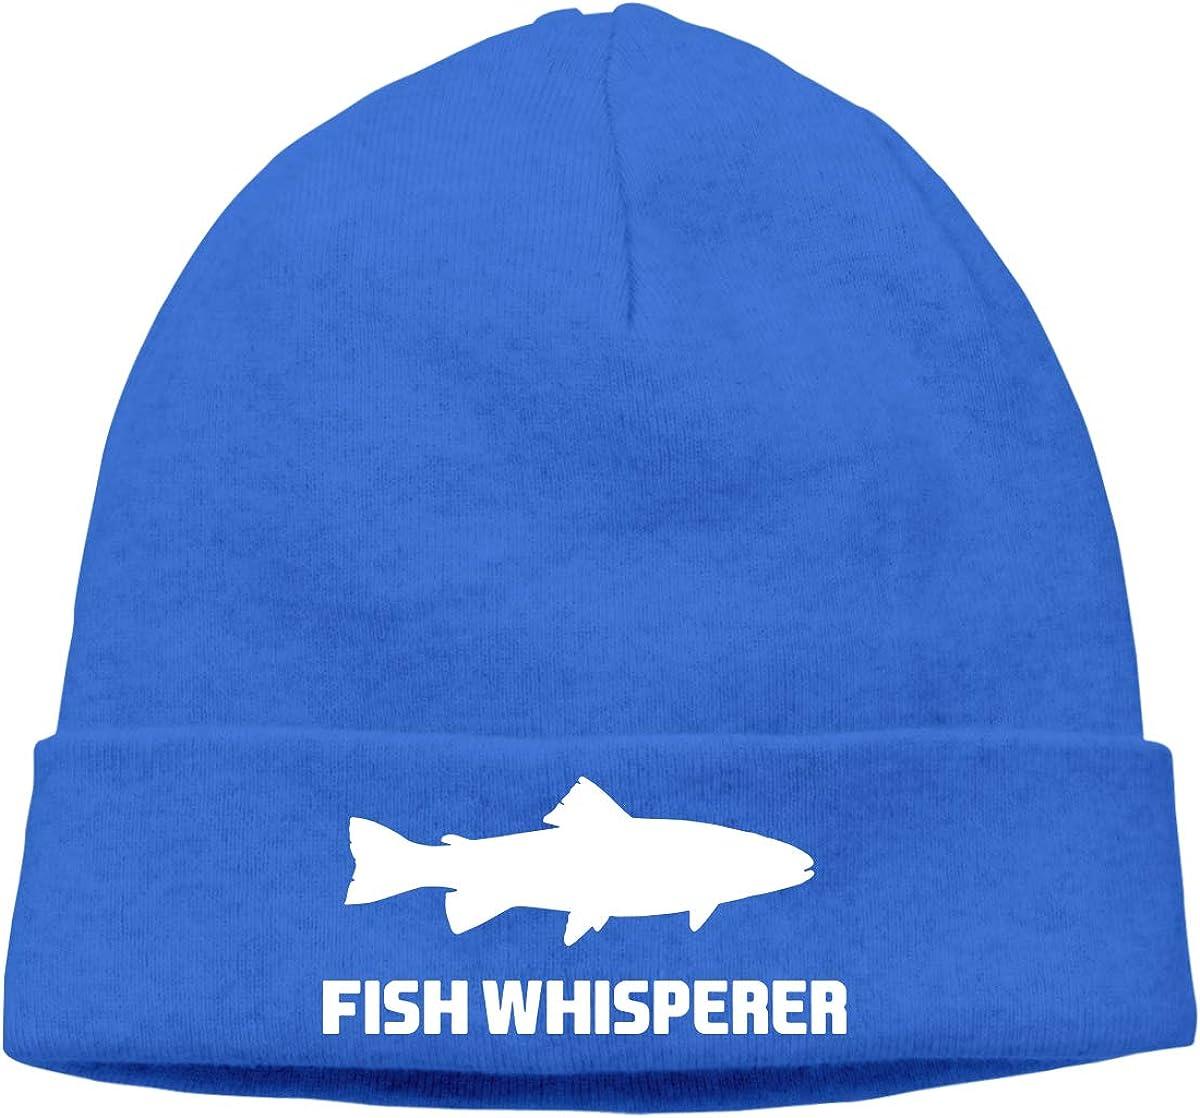 Cgi03T-2 Soft Knitting Hat for Unisex Fish Whisperer Salmon Stocking Cap